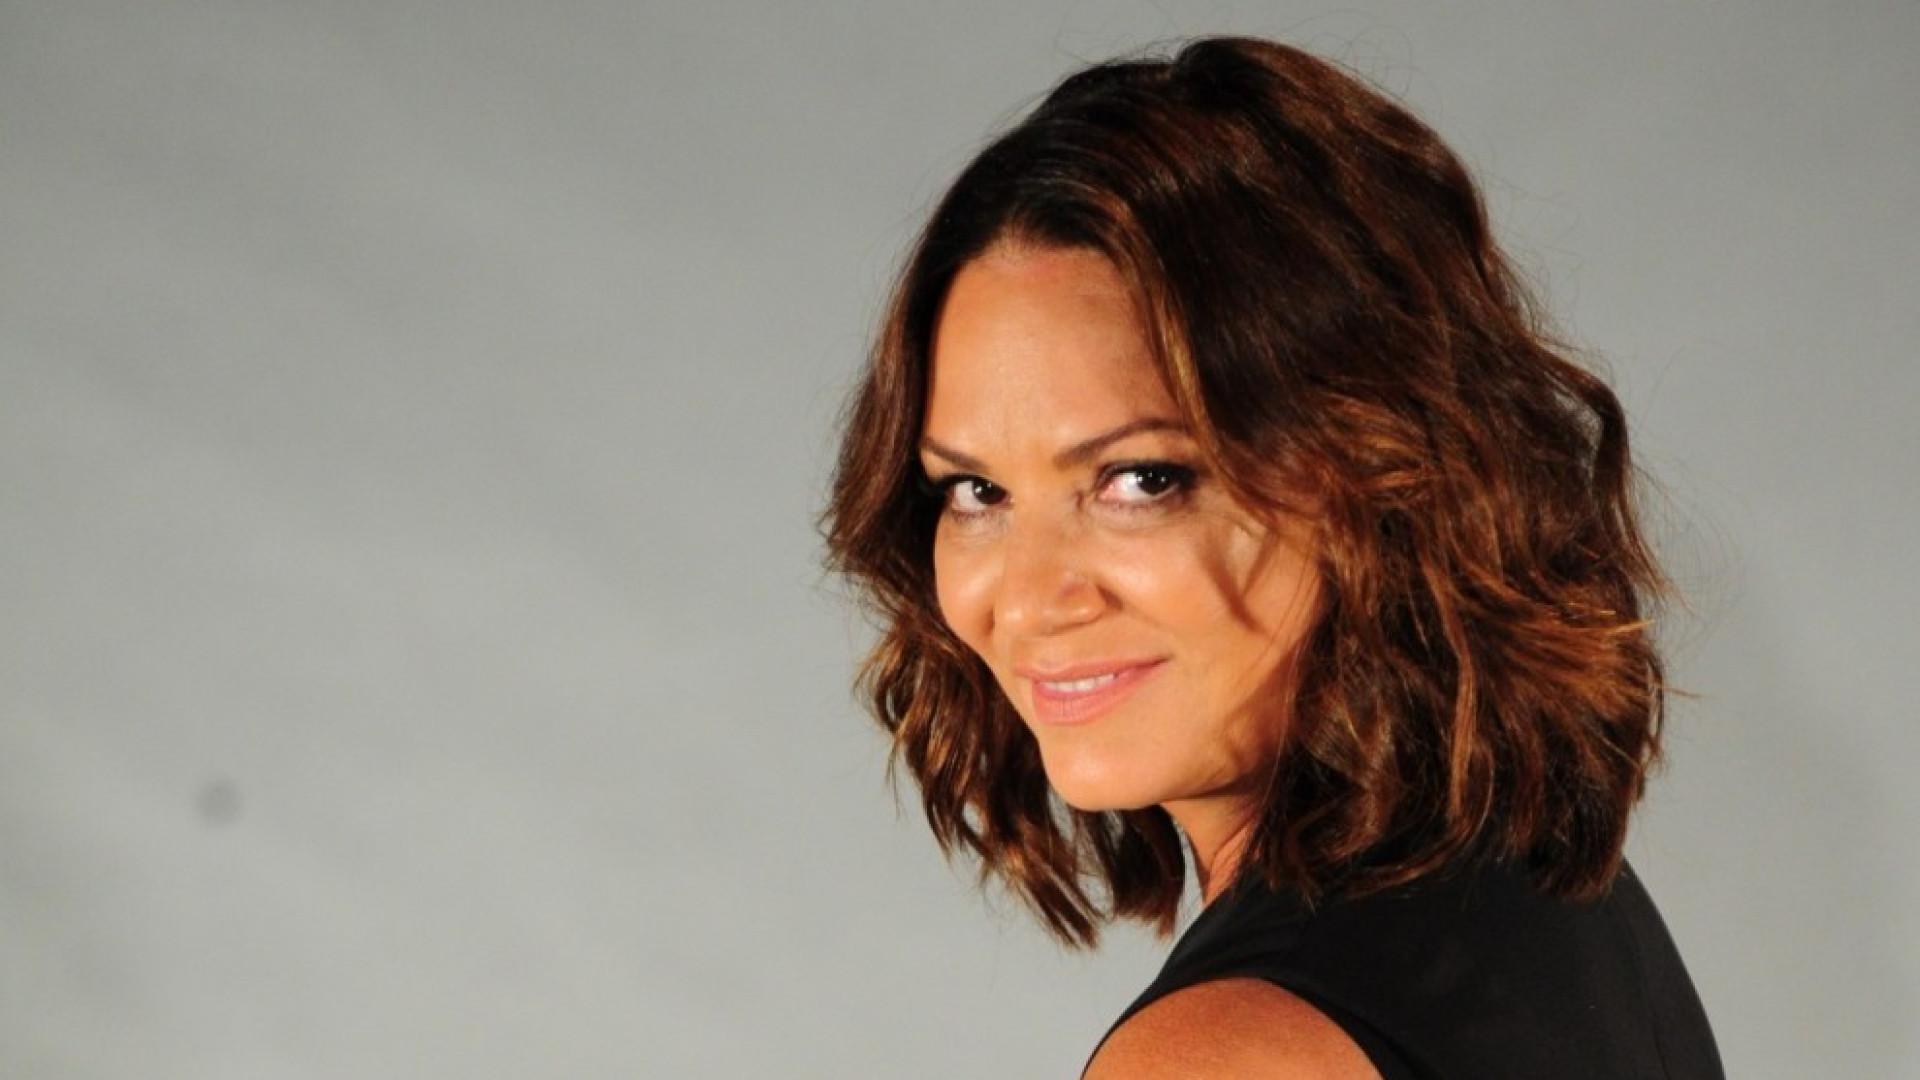 Luiza Brunet será indenizada por receber insultos na internet